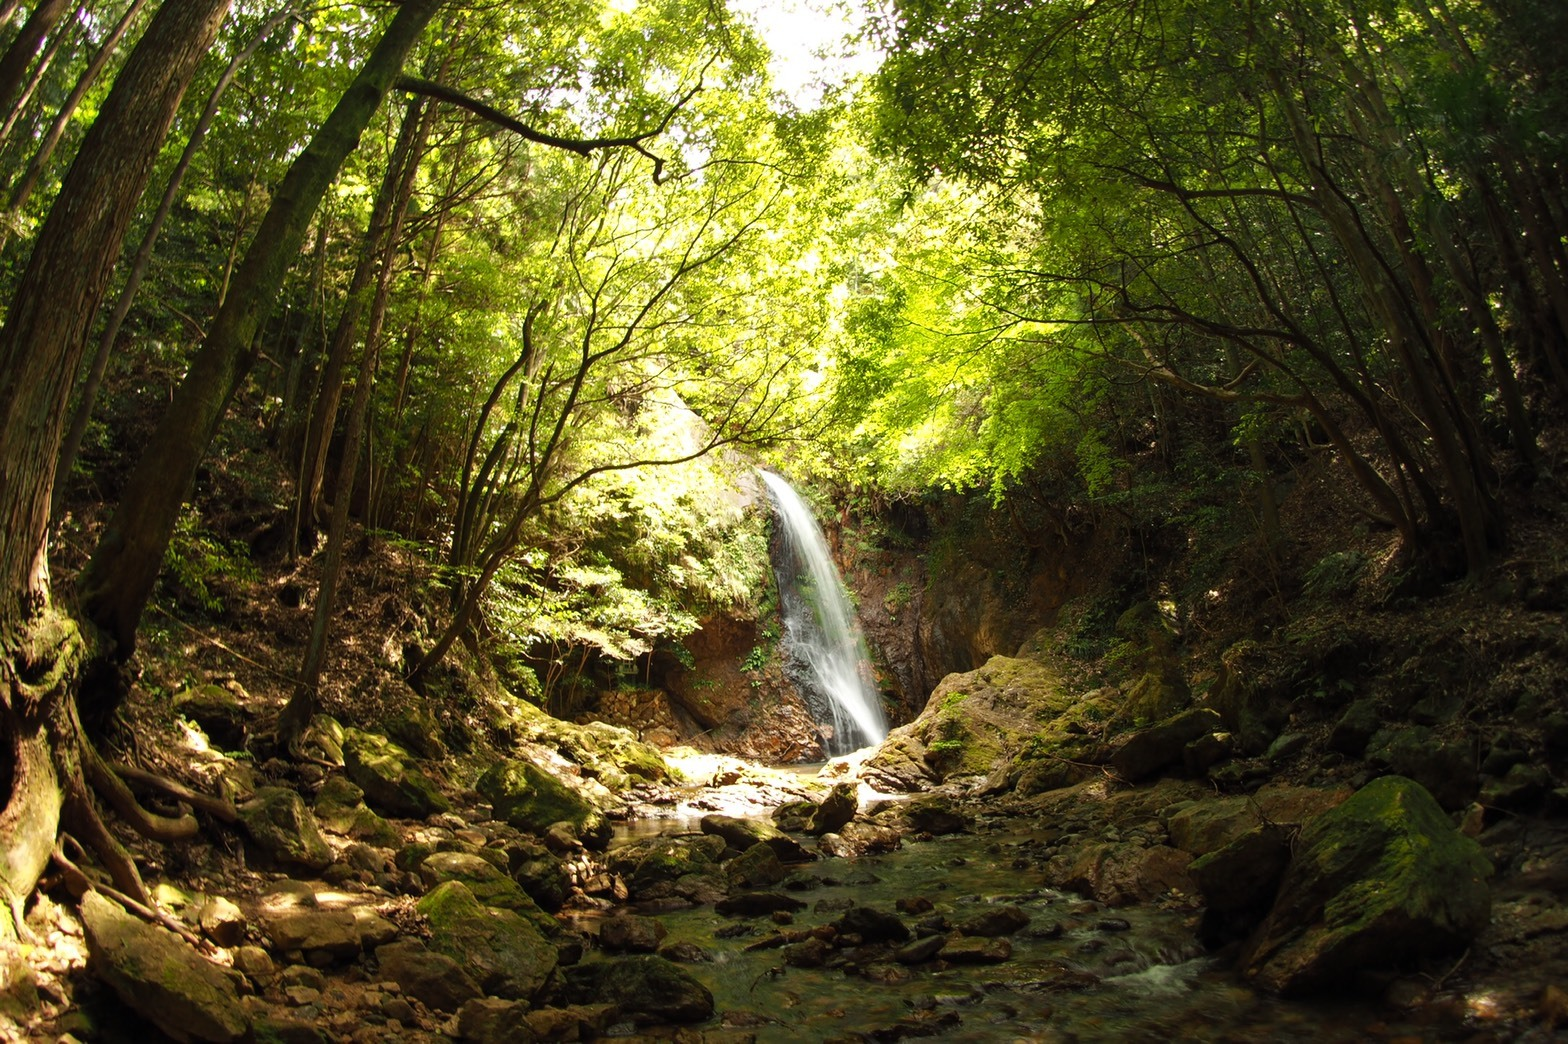 harleydavidson-motorcycle-touring-blog-osaka-minamikawachi-takihata-gongen-waterfall-3.jpg